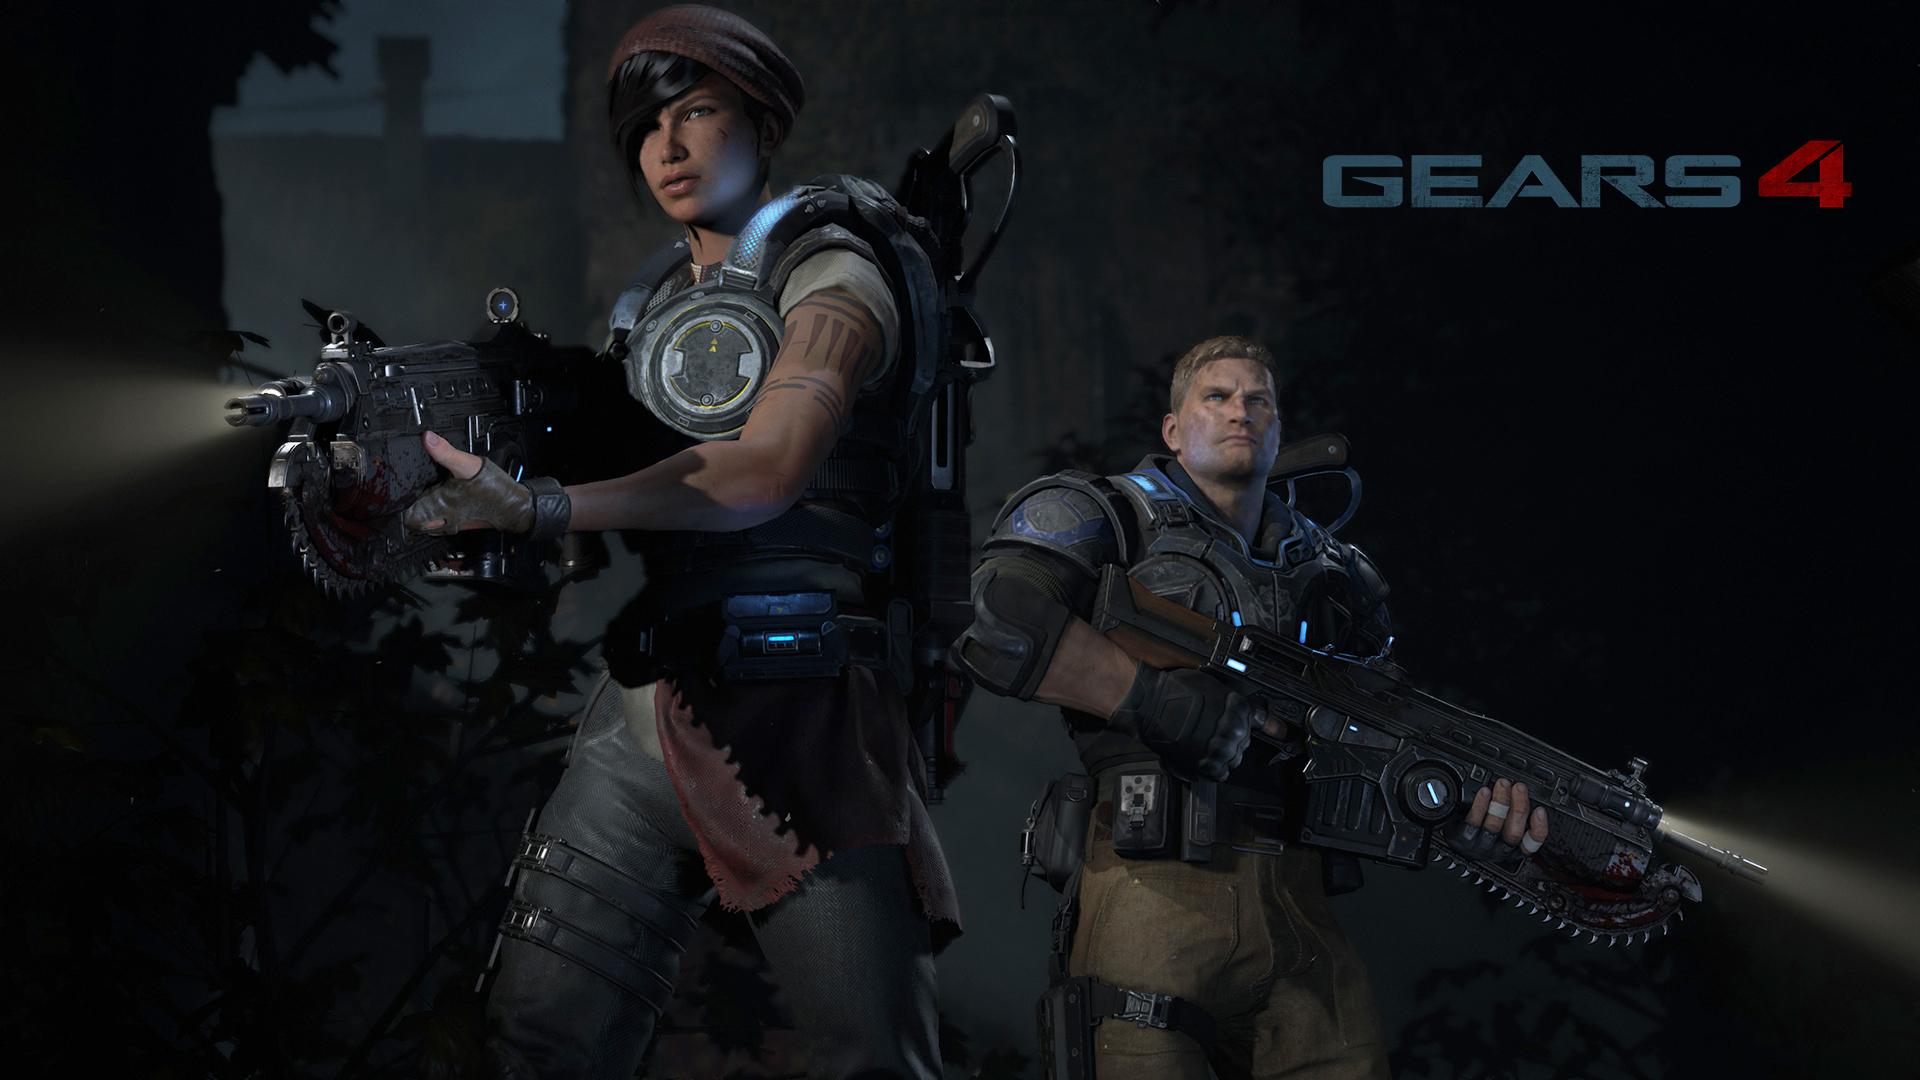 Gears of War 4 : vidéos de gameplay et récompenses